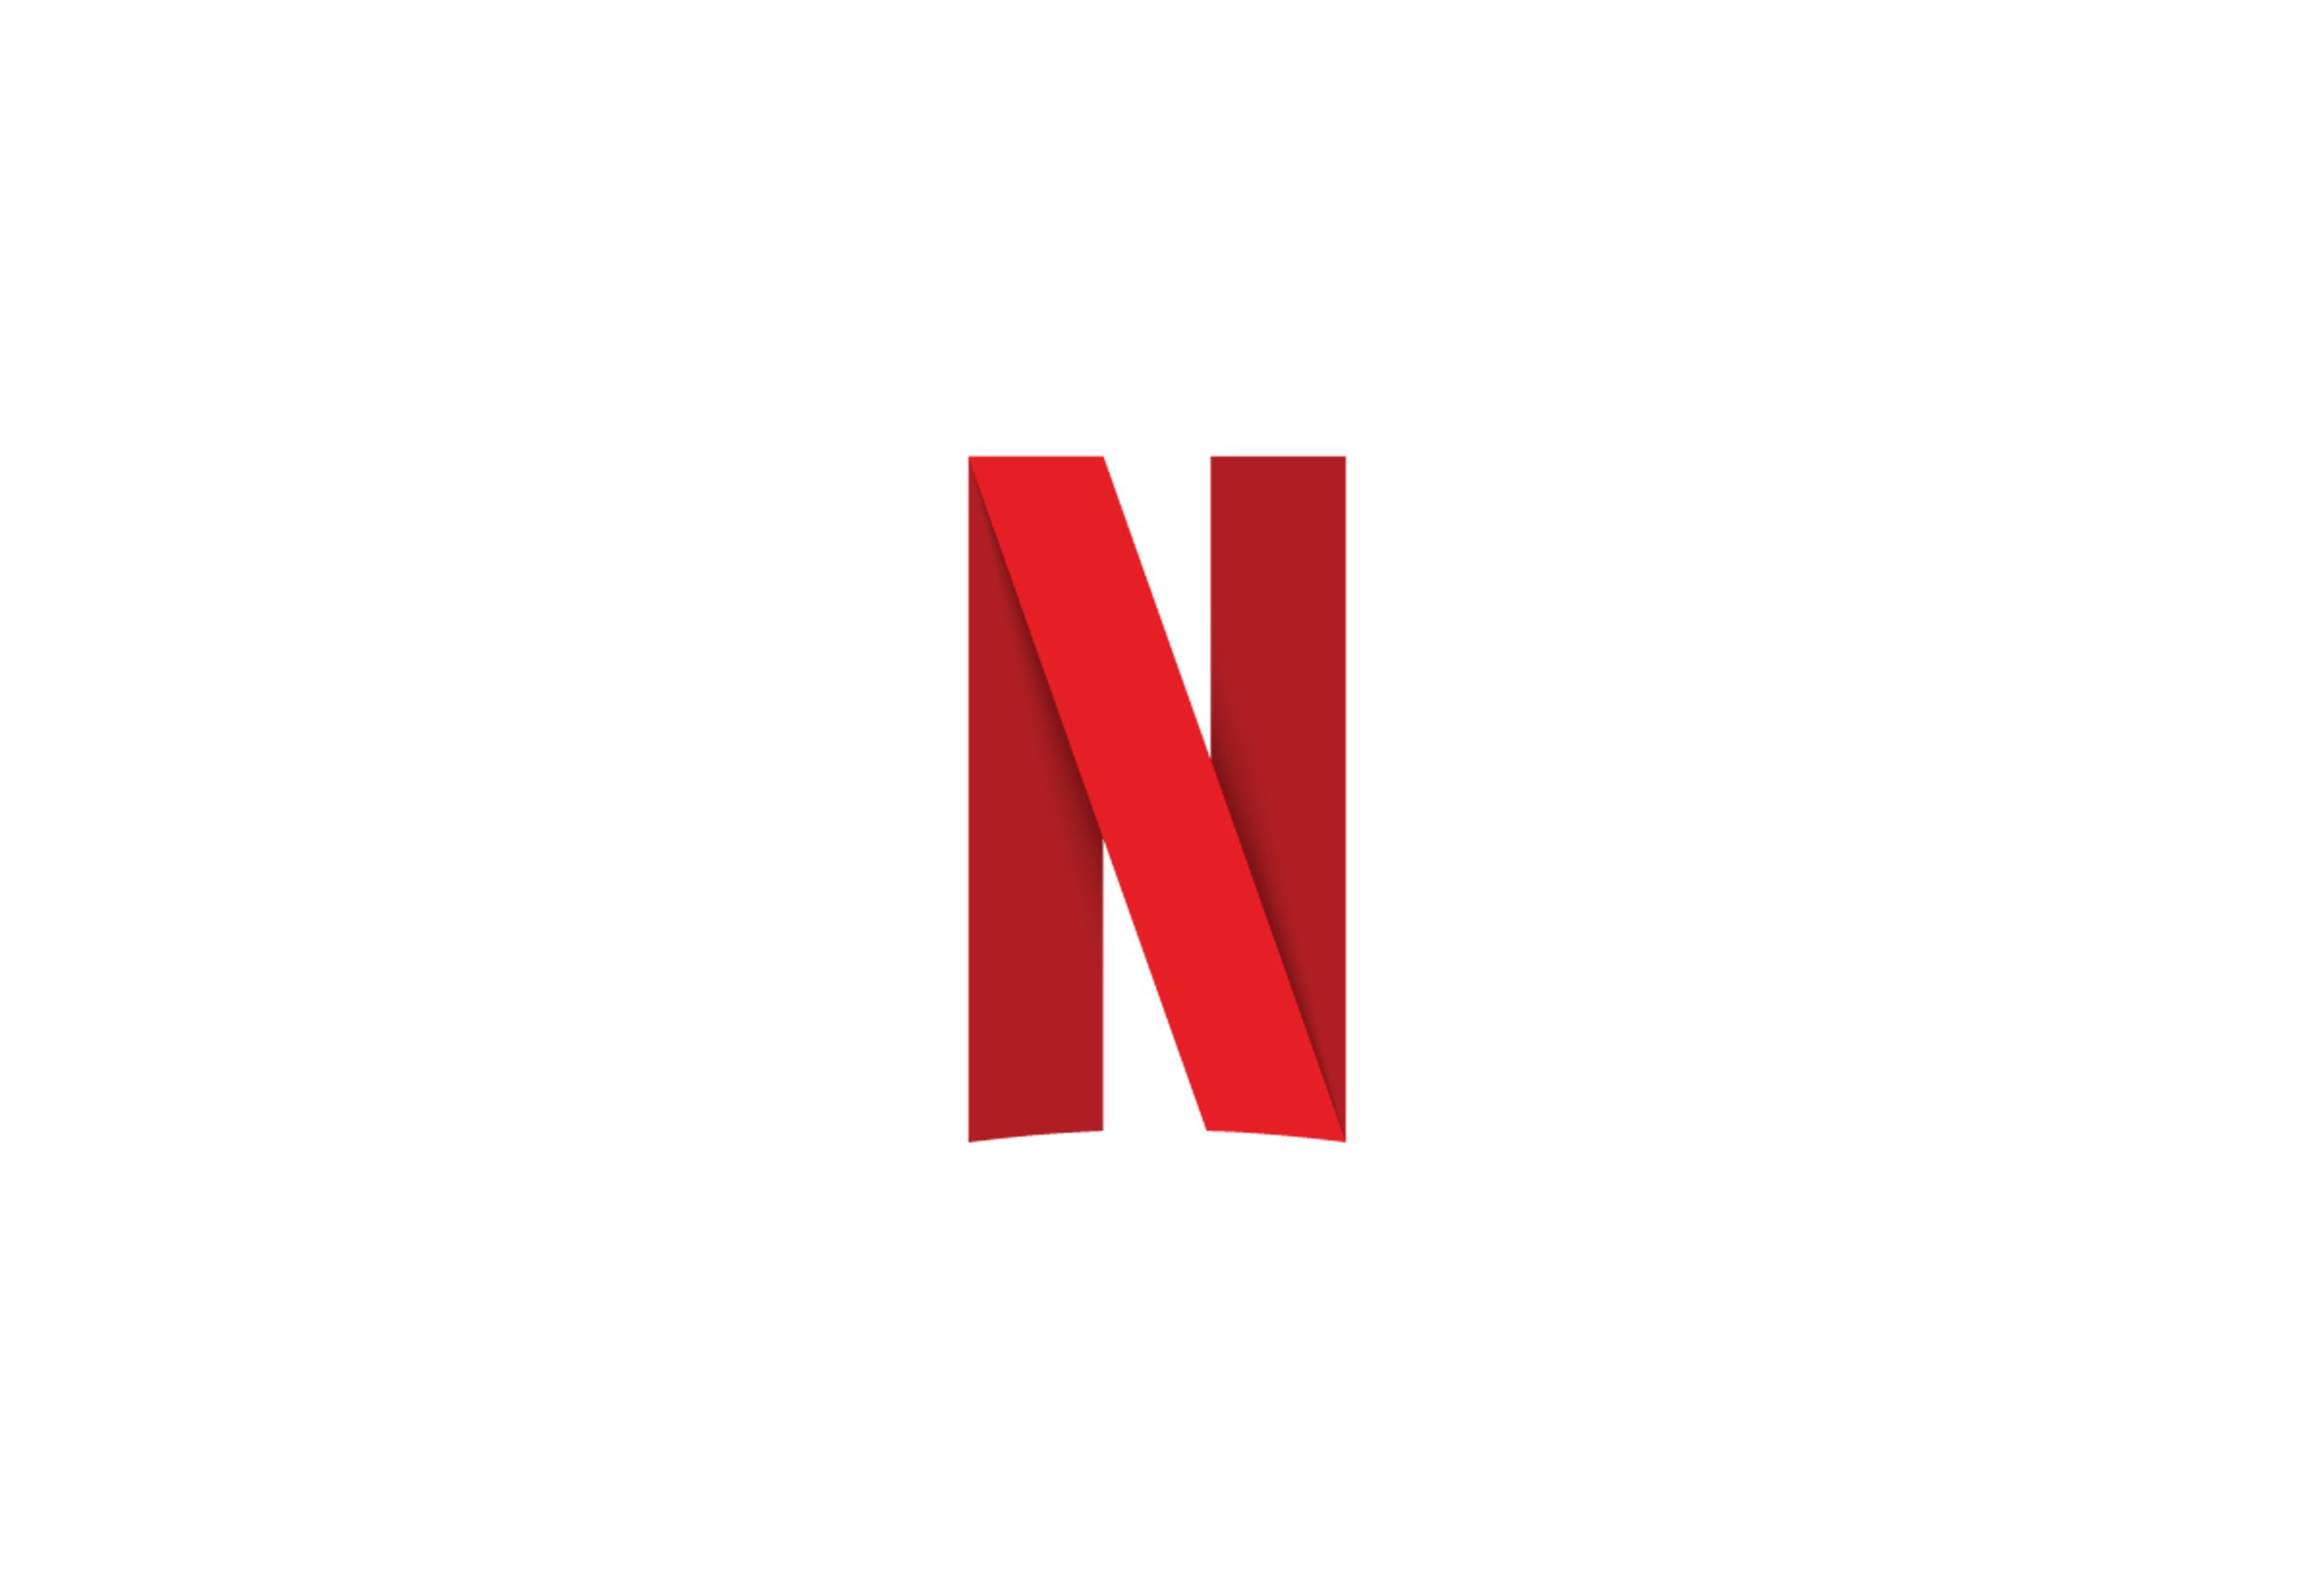 Netflix Logo And Symbol Design History And Evolution Symbol Design Netflix Symbols